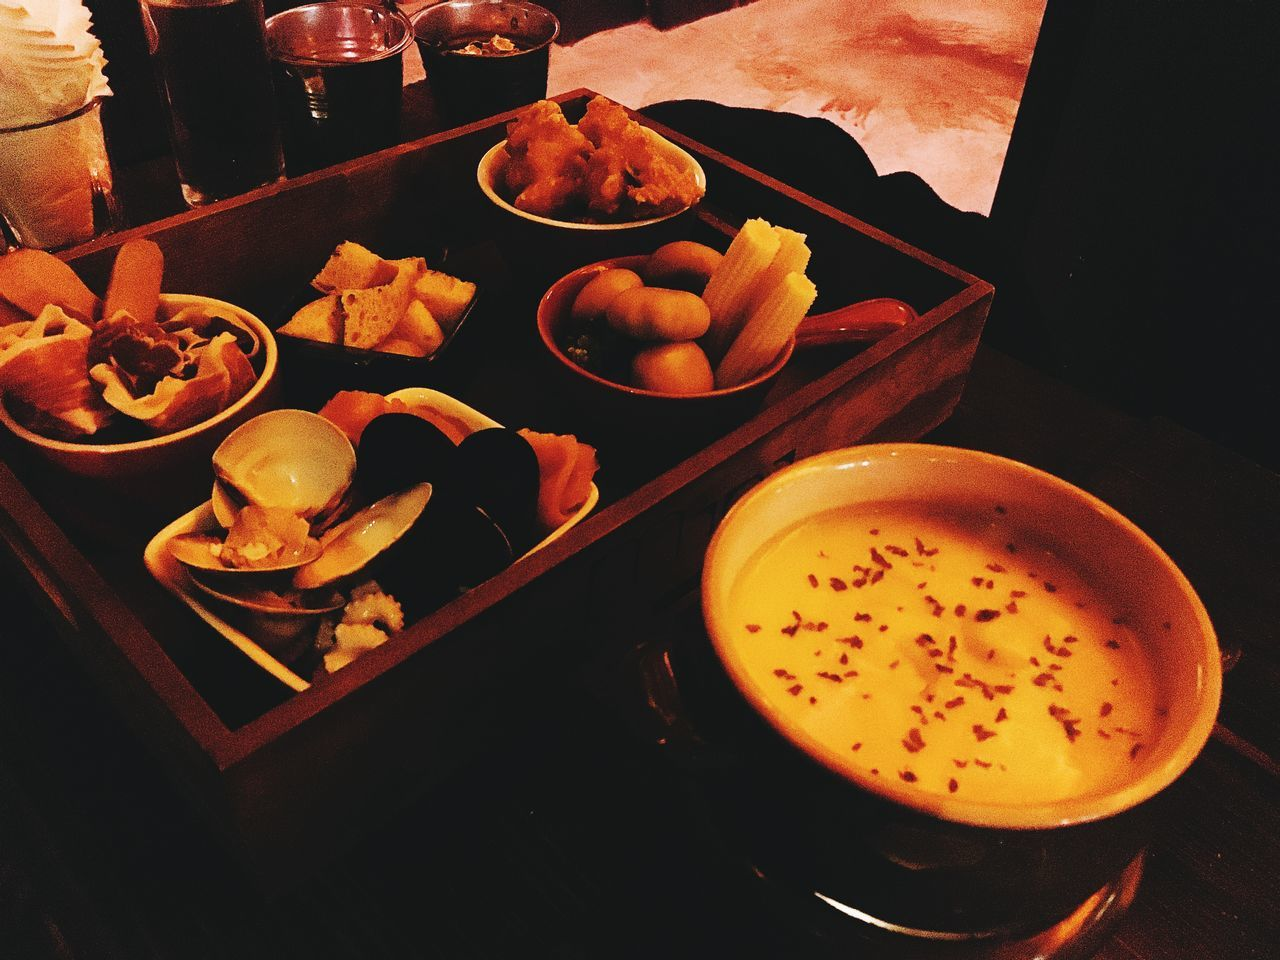 CheeseFondue Hongkongfood Hongkonger Hanging Out